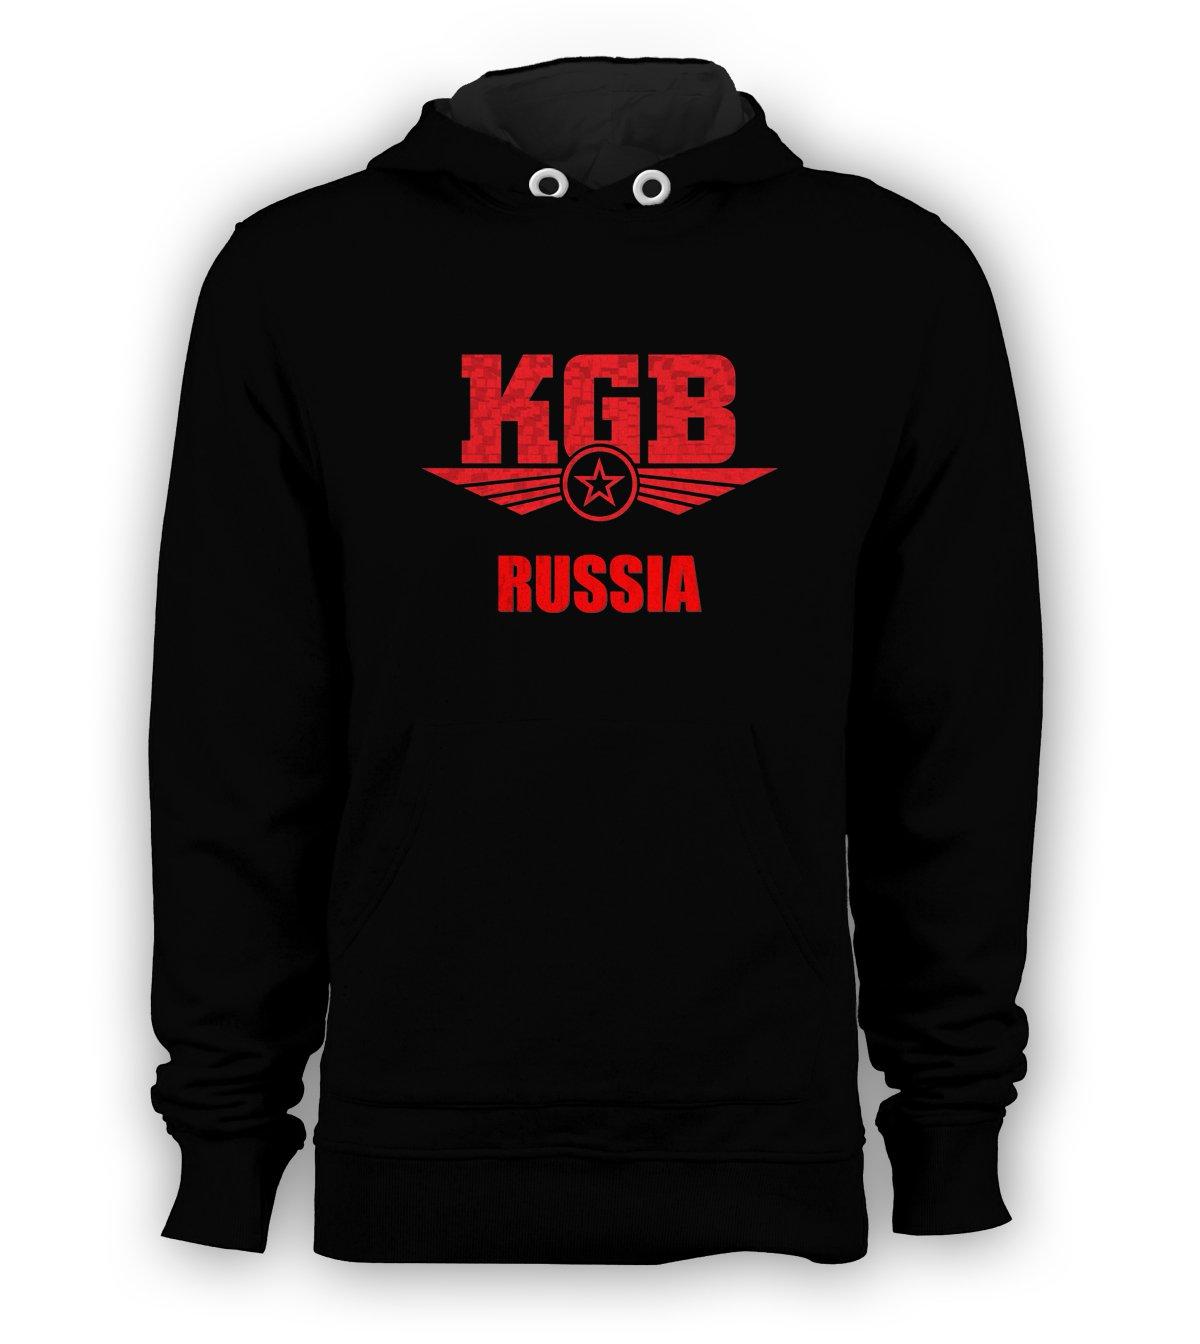 KGB Russia Pullover Hoodie Men USSR Spy Agent Vladimir Putin Sweatshirts Size S to 3XL New Black